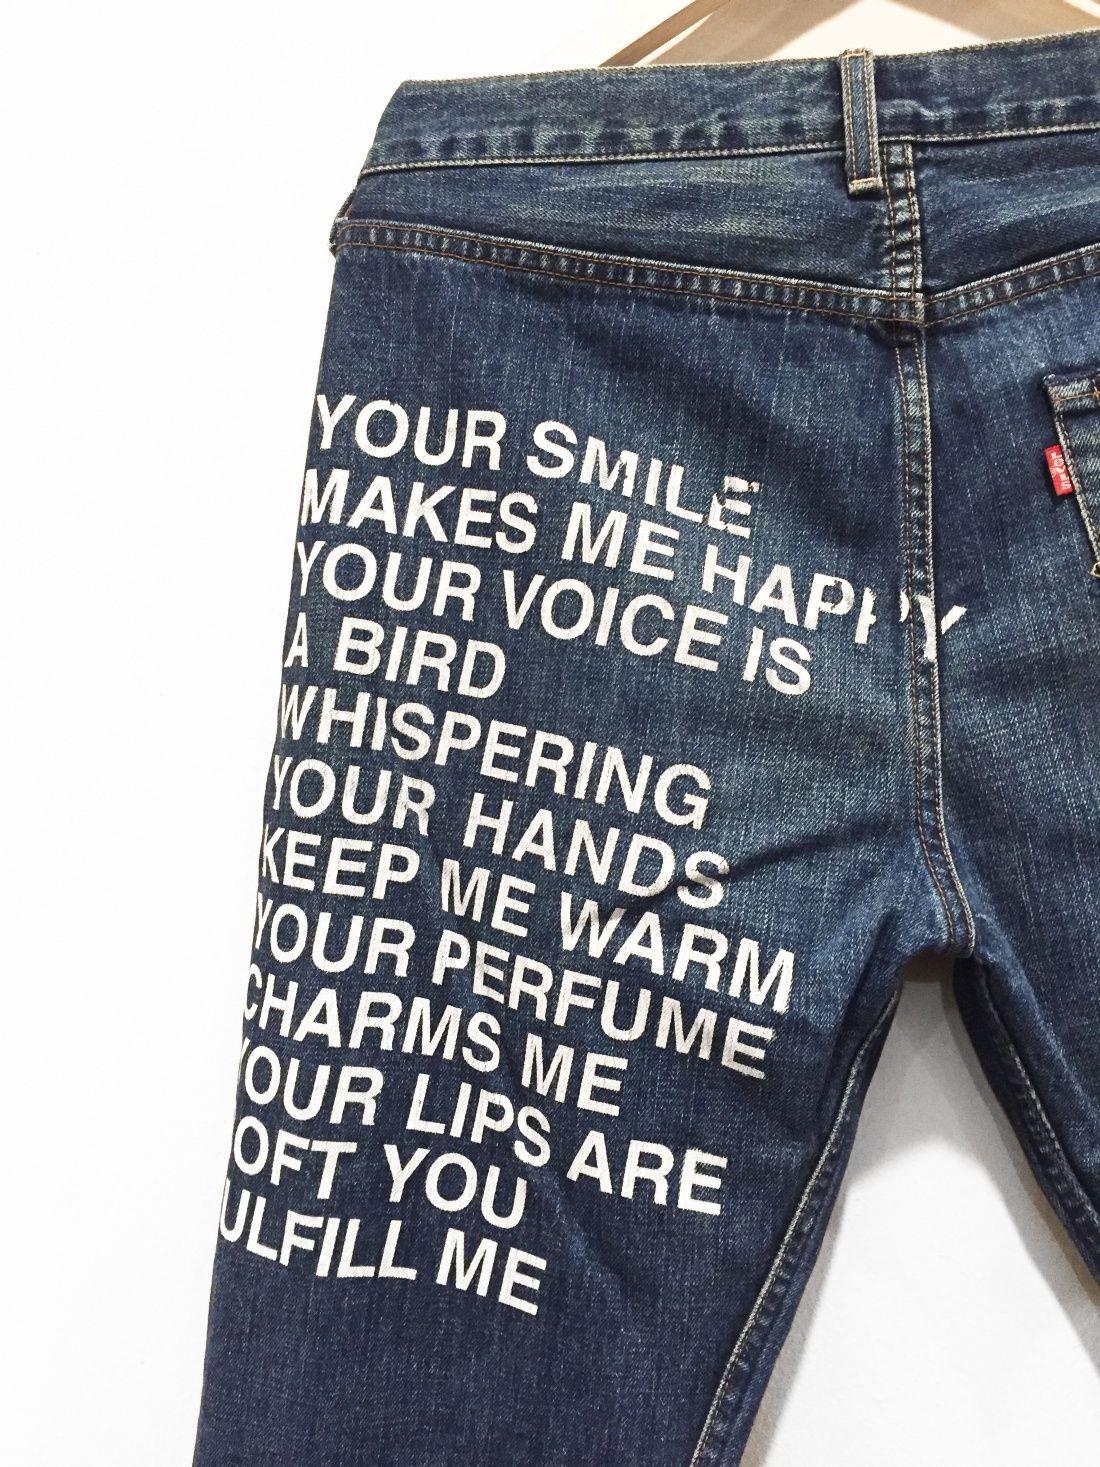 7e1a25f61e Vintage 2001 Poem Jeans | DENIM JACKET INSPIRATION...PINS AND ...